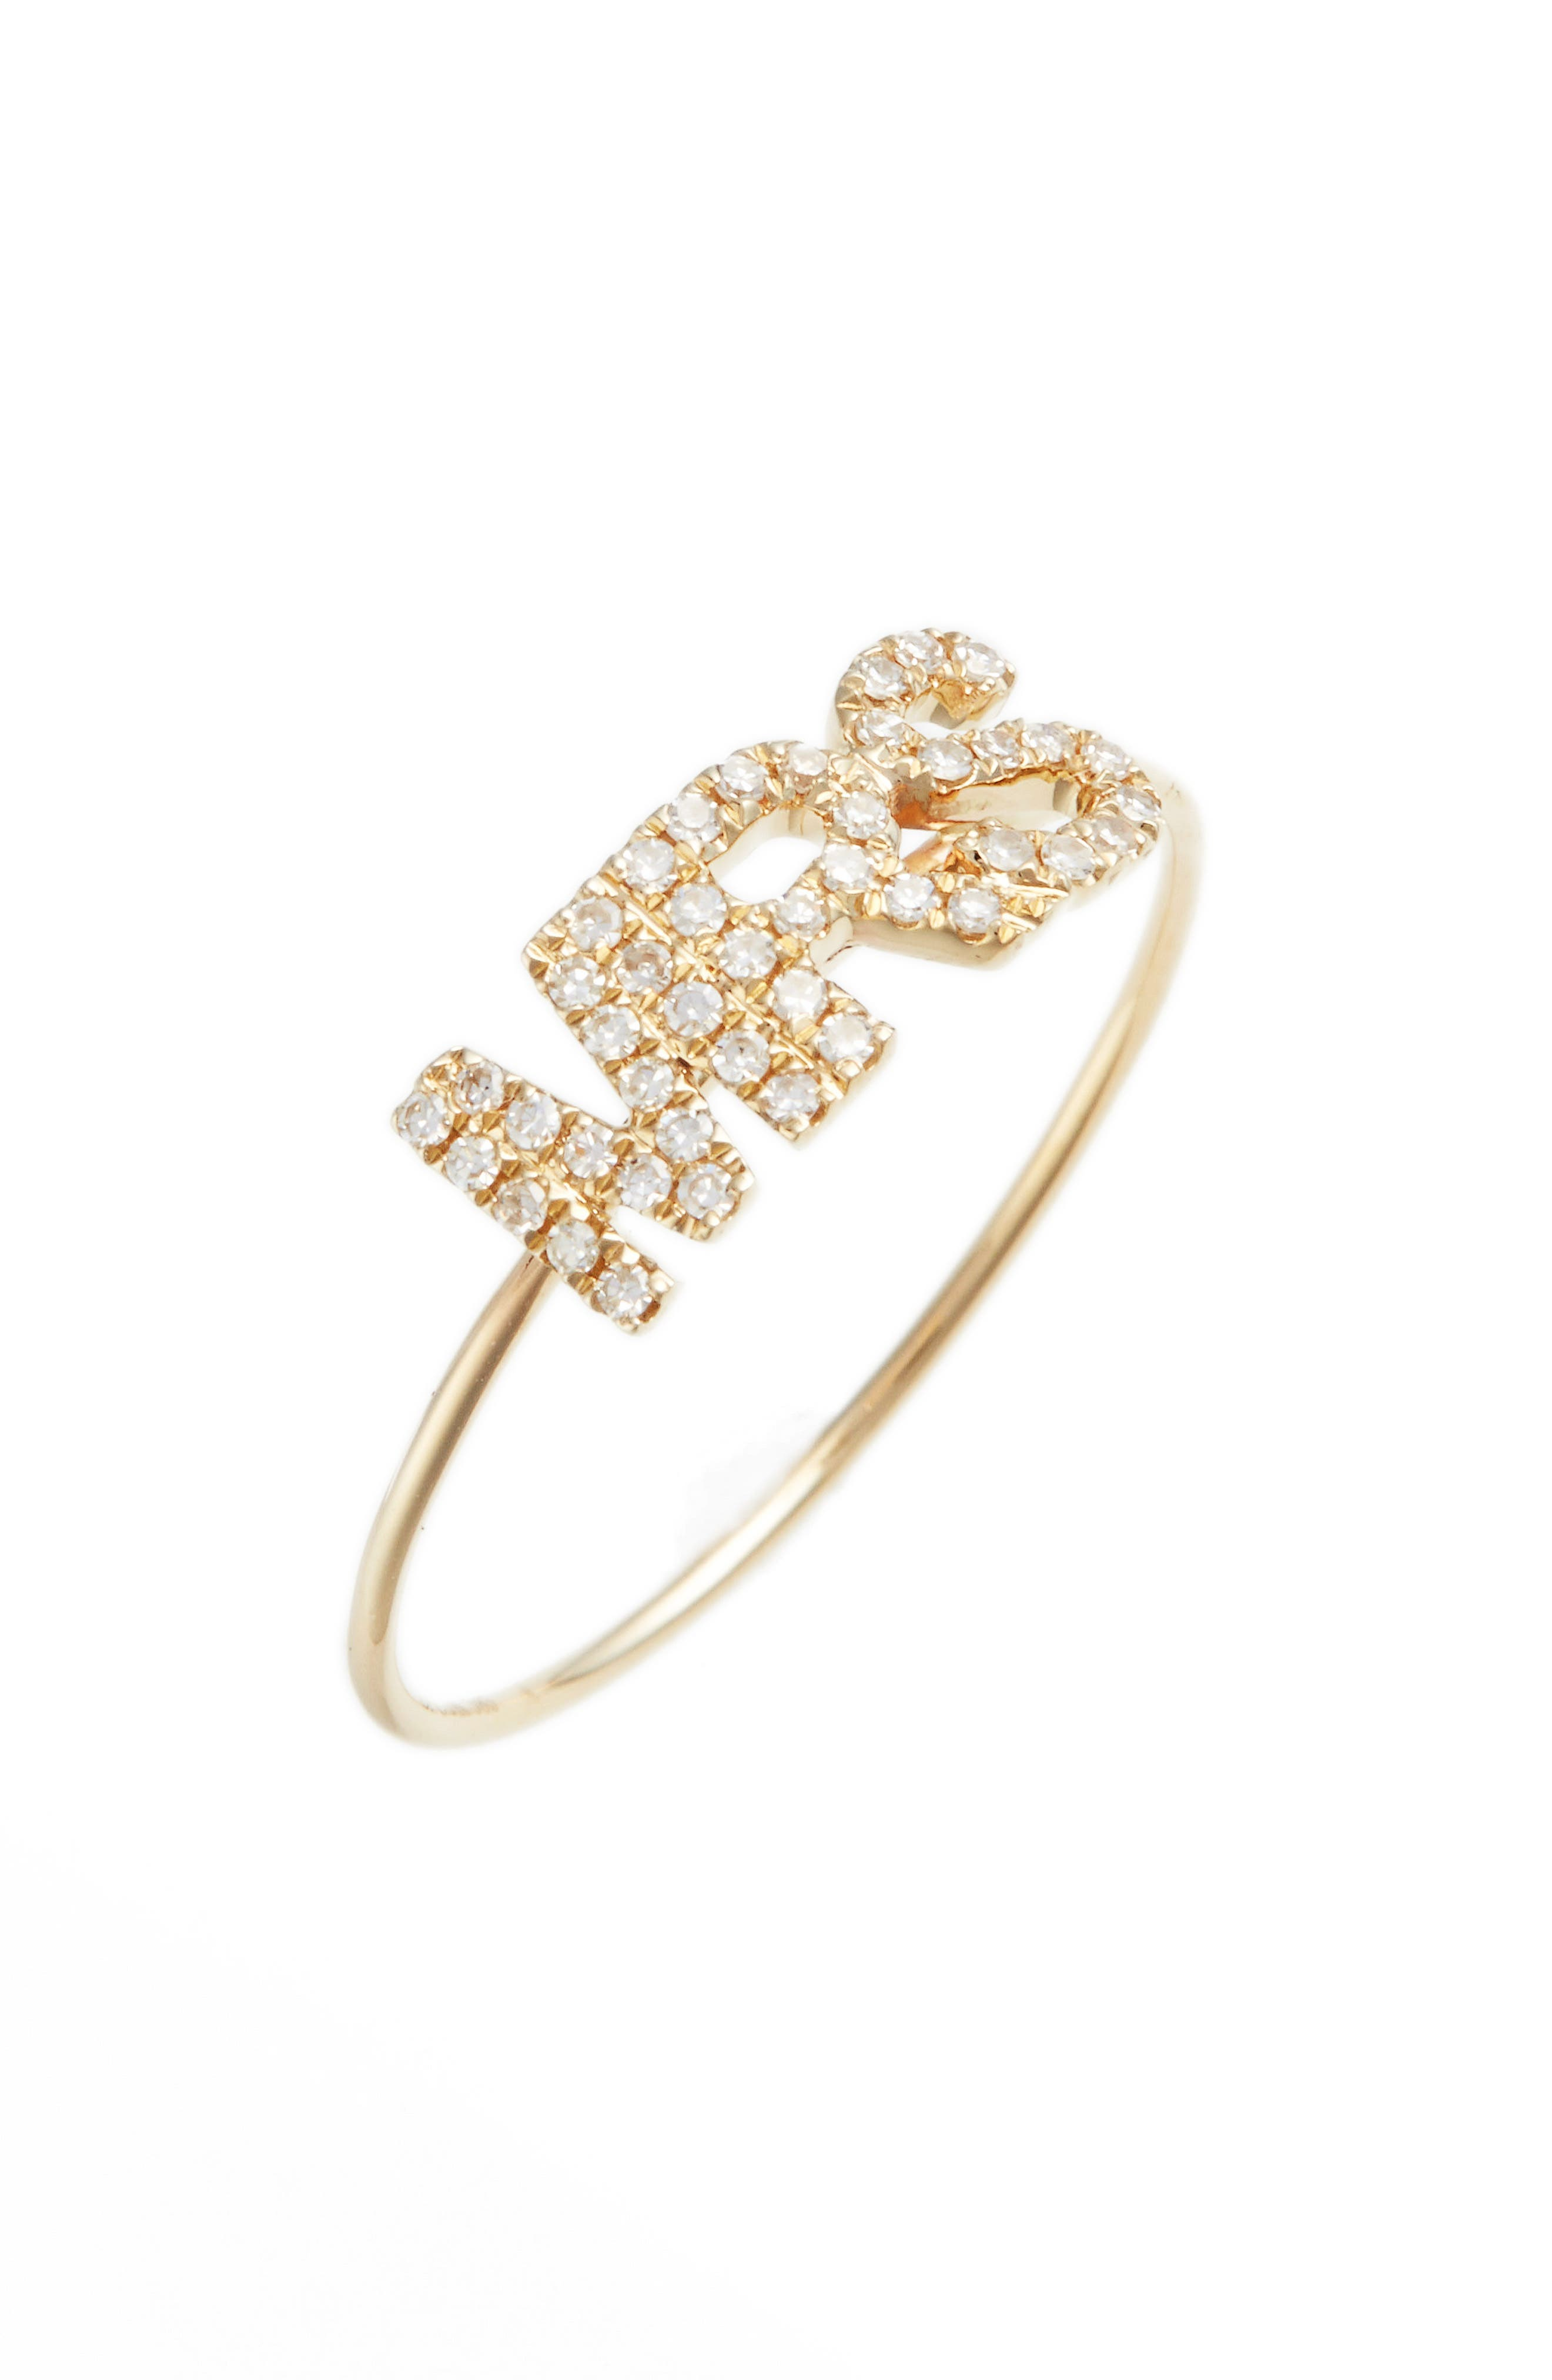 Mrs. Diamond Ring,                             Main thumbnail 1, color,                             YELLOW GOLD